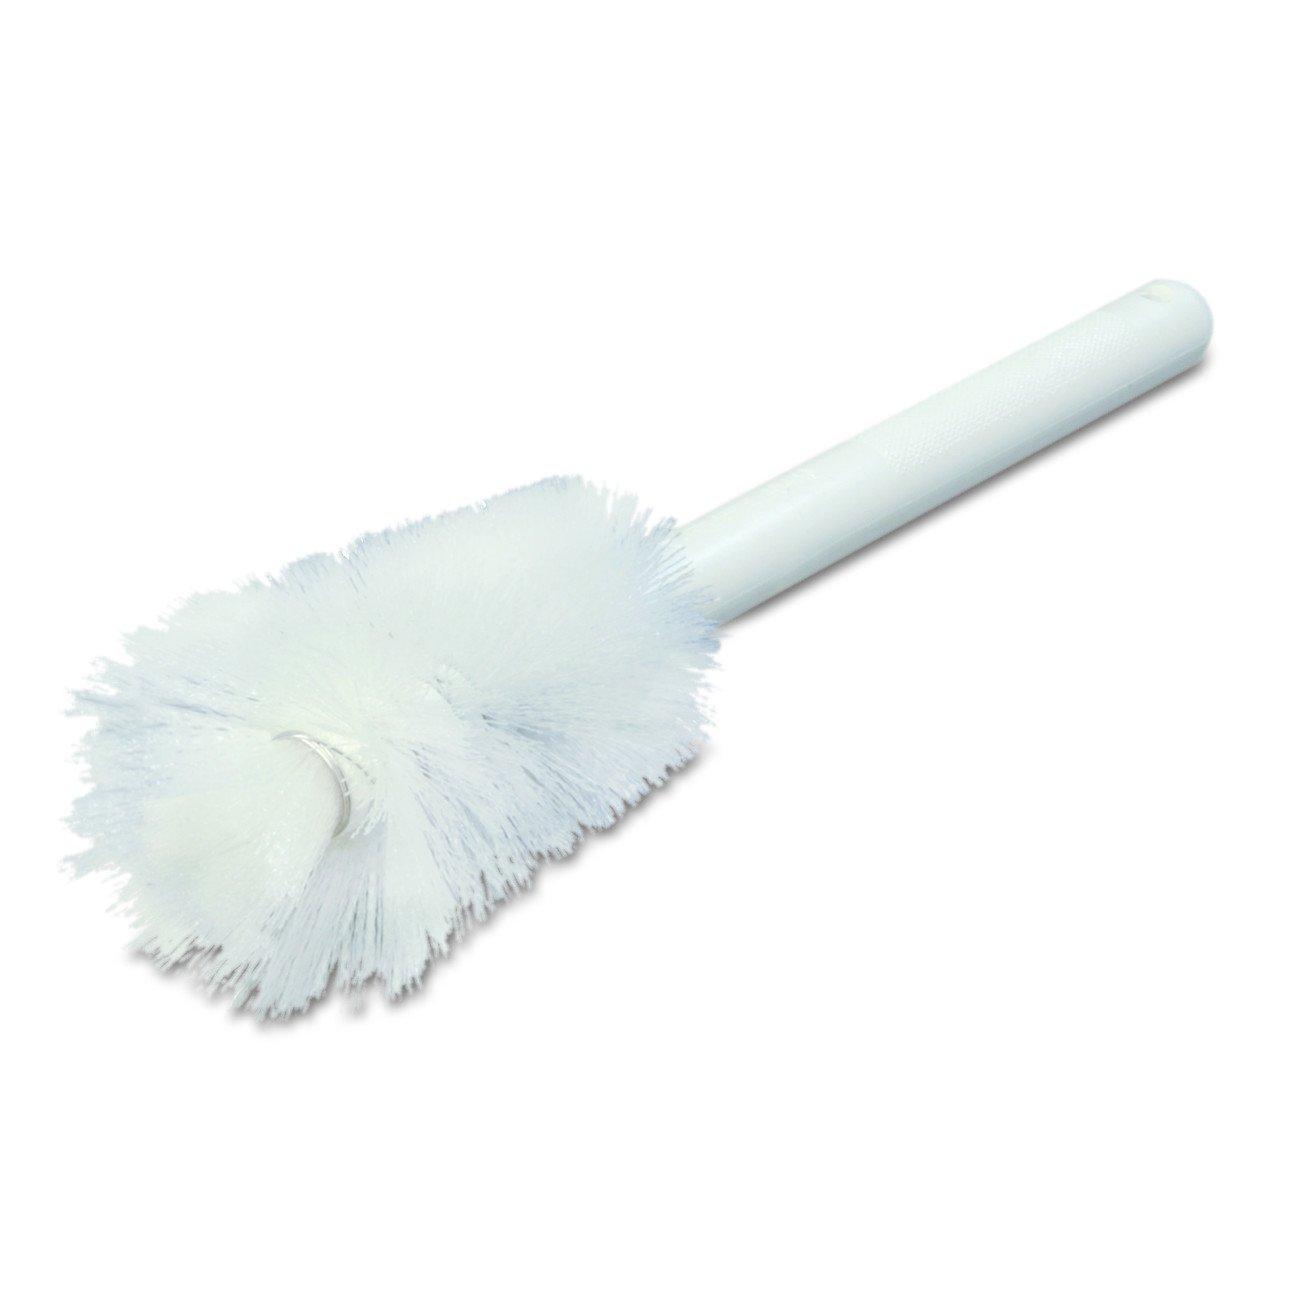 Carlisle 4046600 Sparta Handle Pint Bottle Brush, Polyester Bristles, 2-1/2' Bristle Diameter, 12' Overall Length 2-1/2 Bristle Diameter 12 Overall Length Carlisle Corporation 40466-00